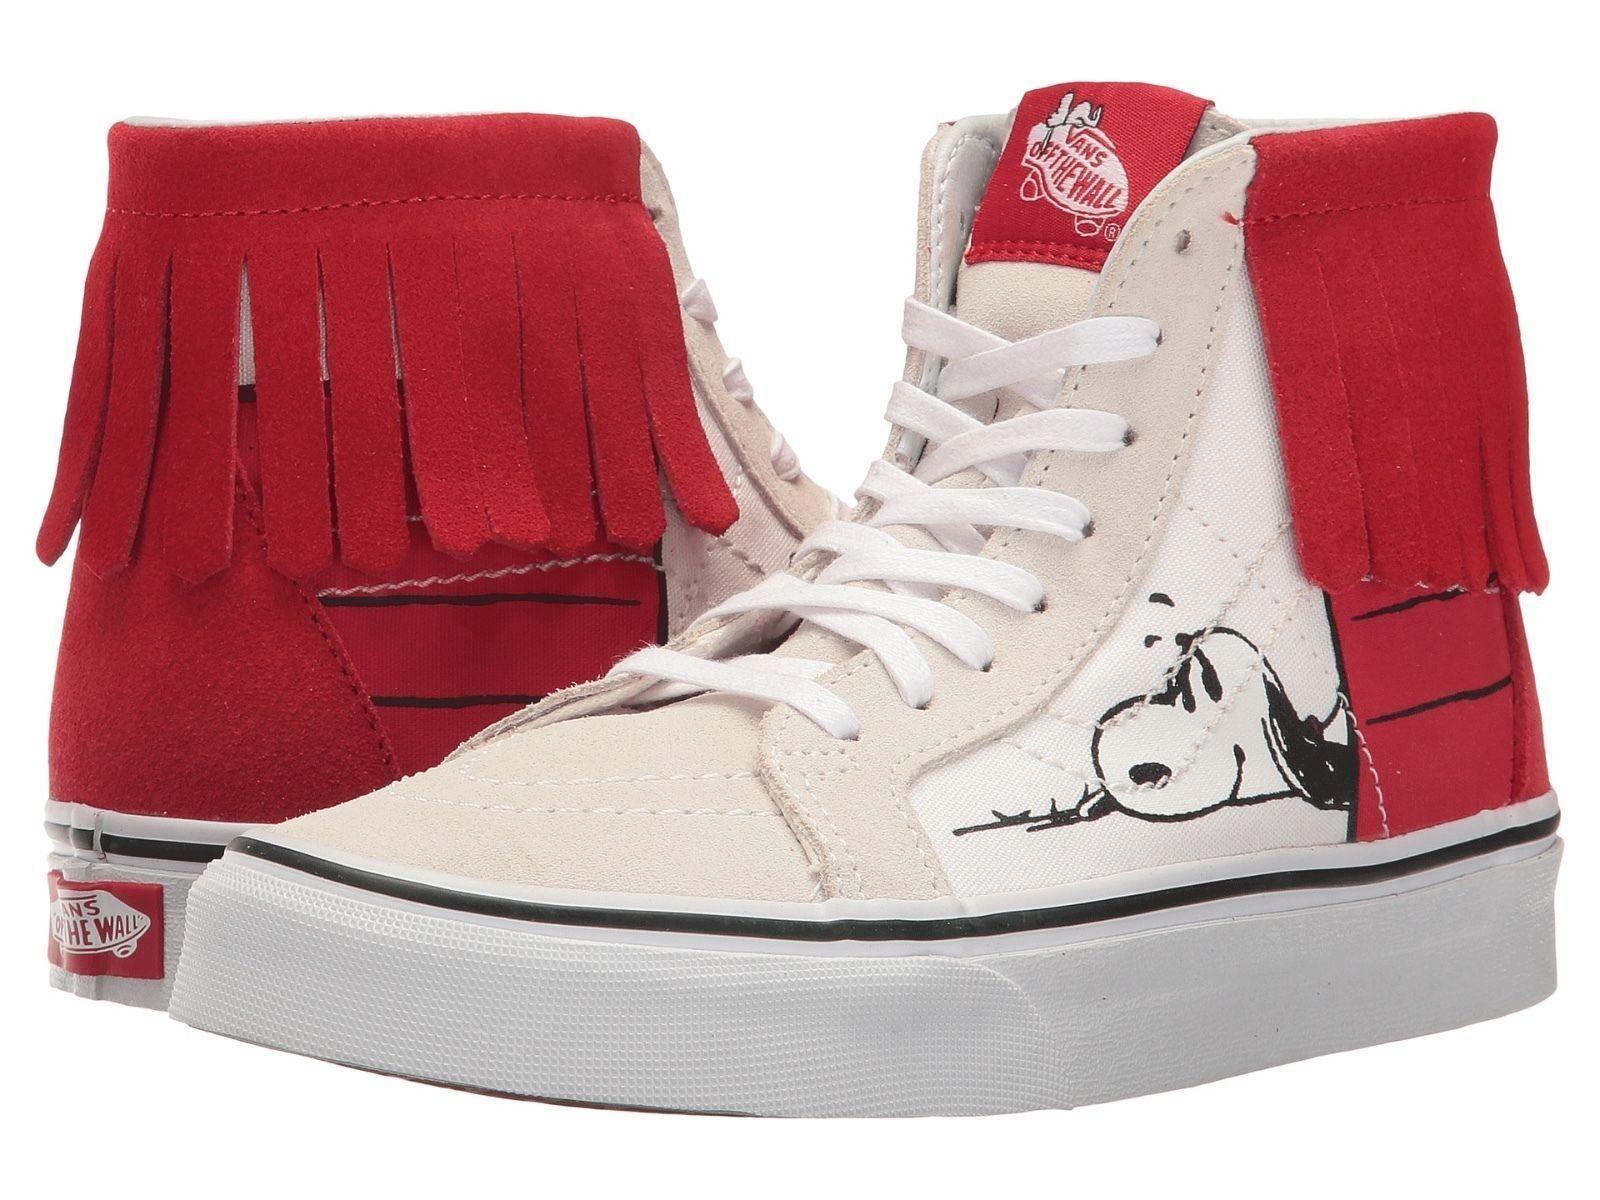 Vans PEANUTS Bone Snoopy Dog House Bone PEANUTS Charlie Braun Sk8 Hi Sbeakers M 5.5  W 7.0 356857